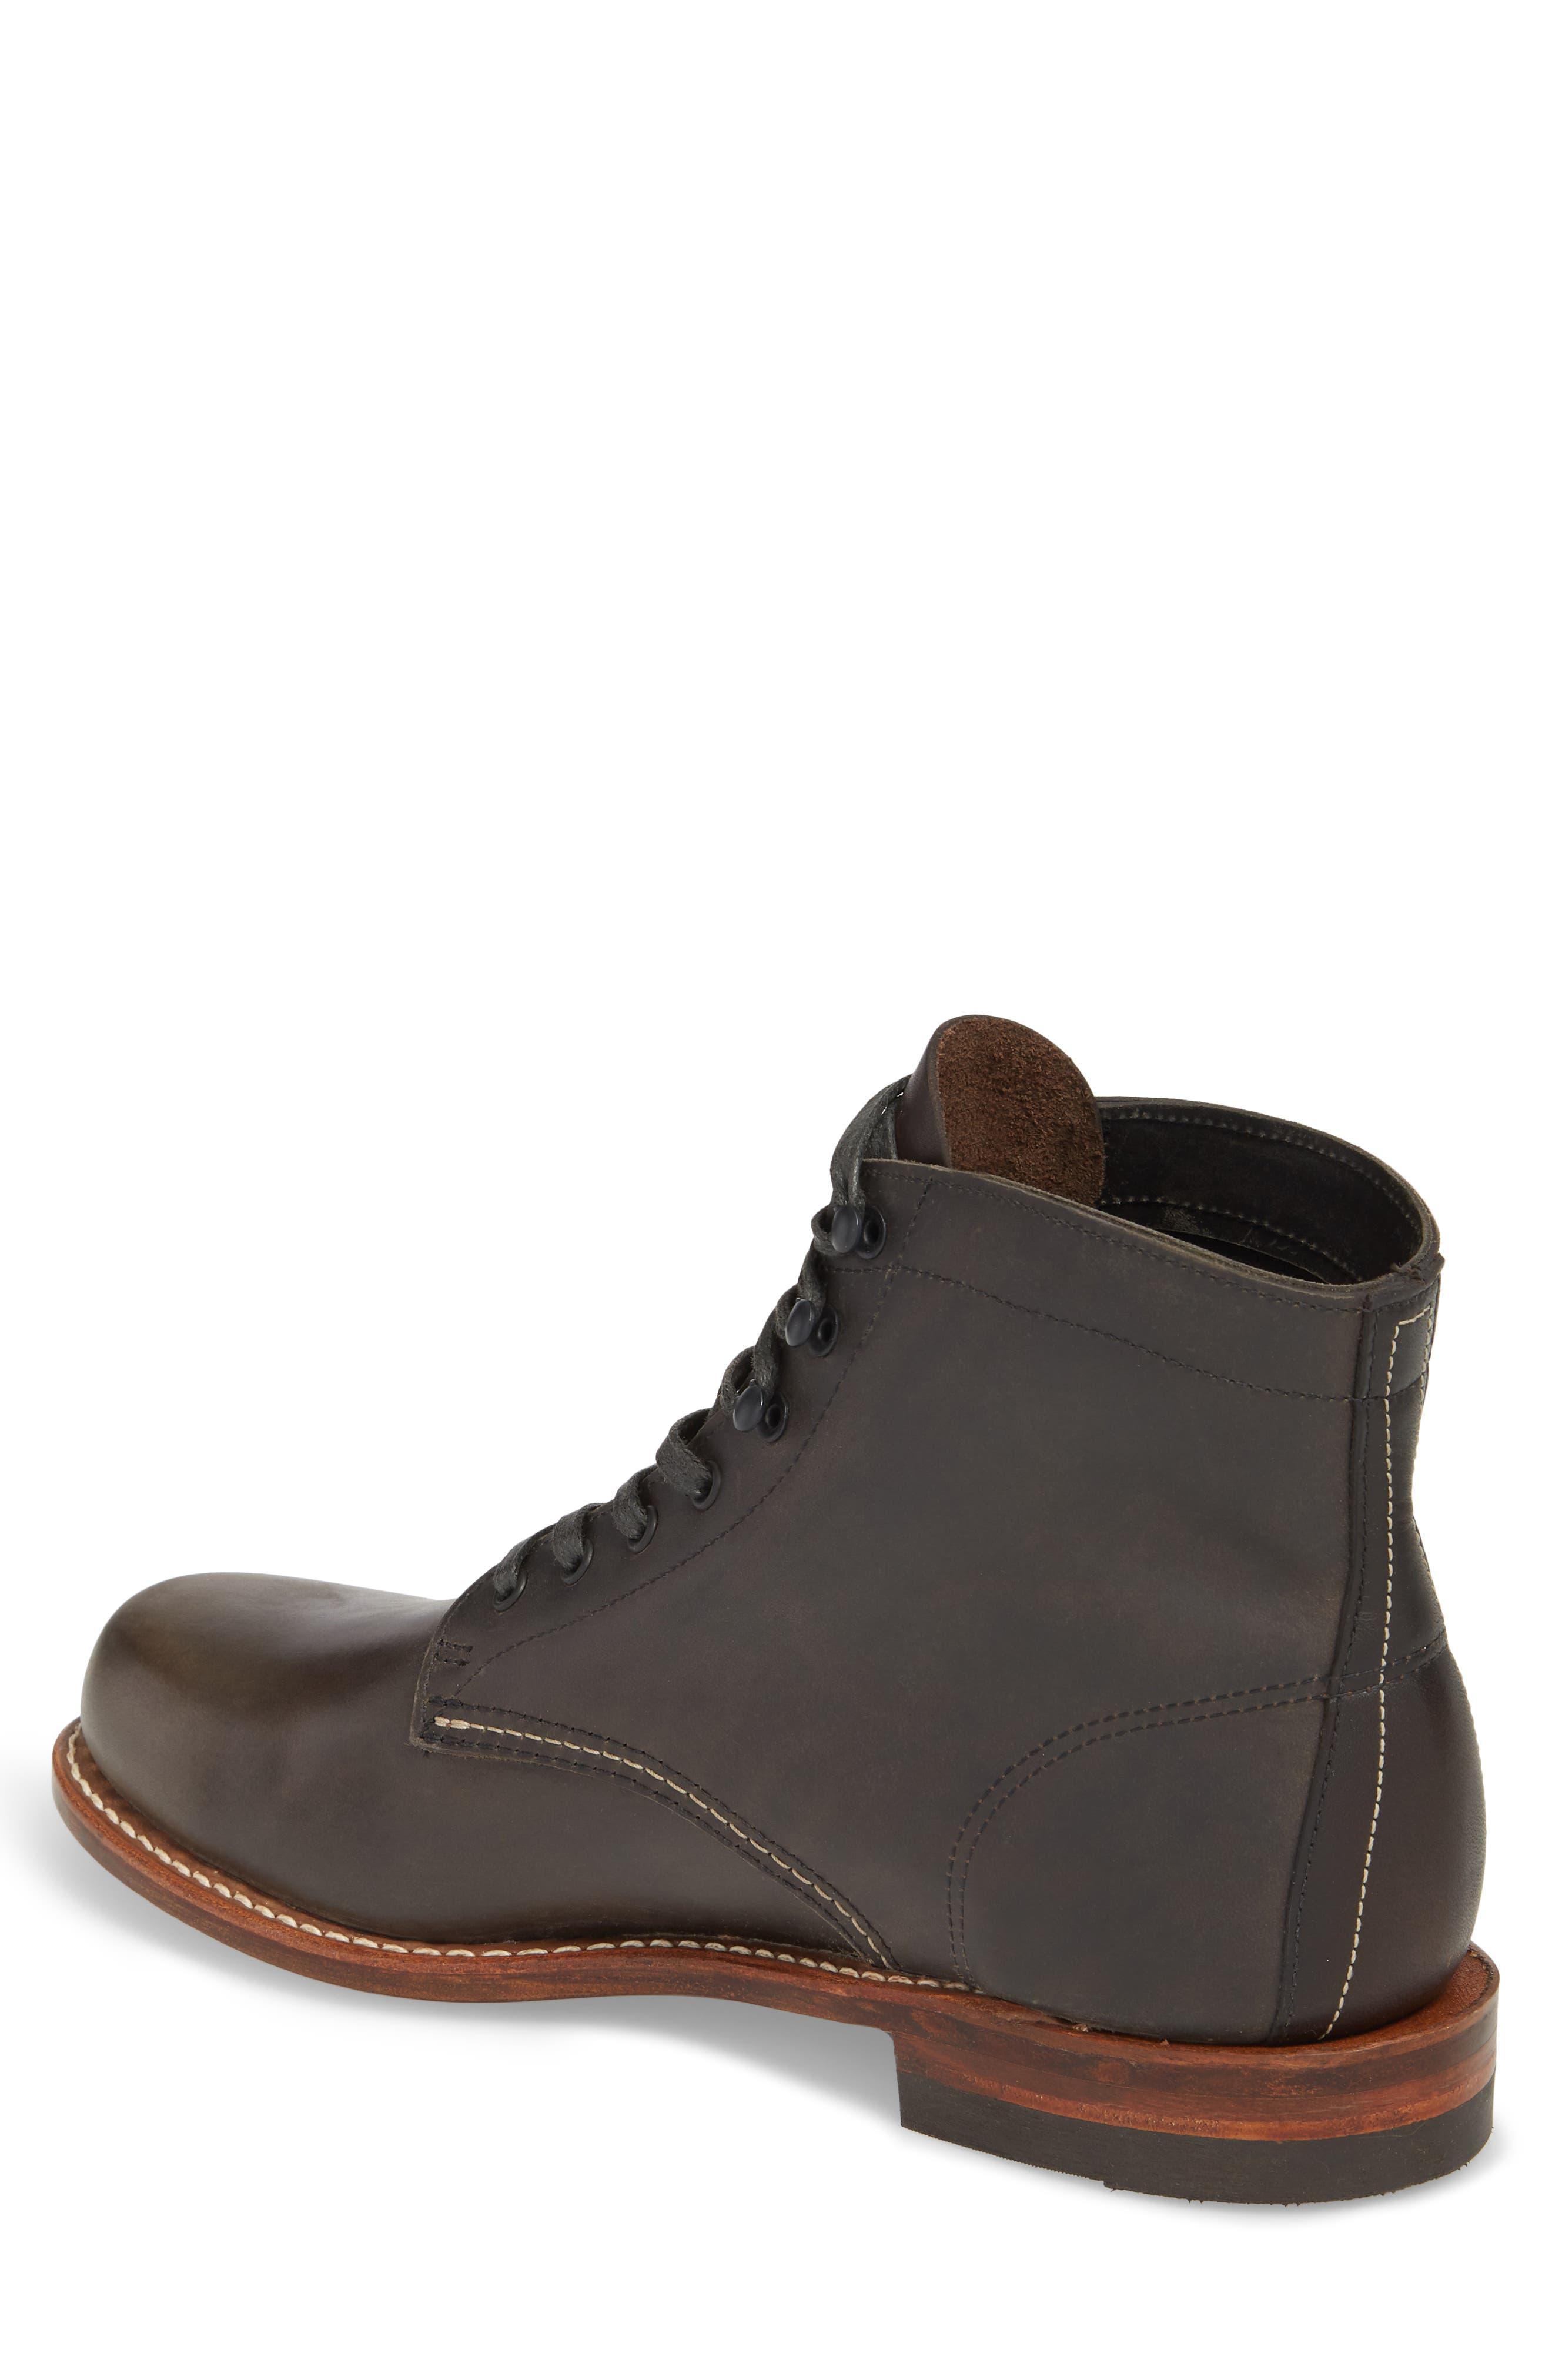 '1000 Mile' Plain Toe Boot,                             Alternate thumbnail 3, color,                             Charcoal